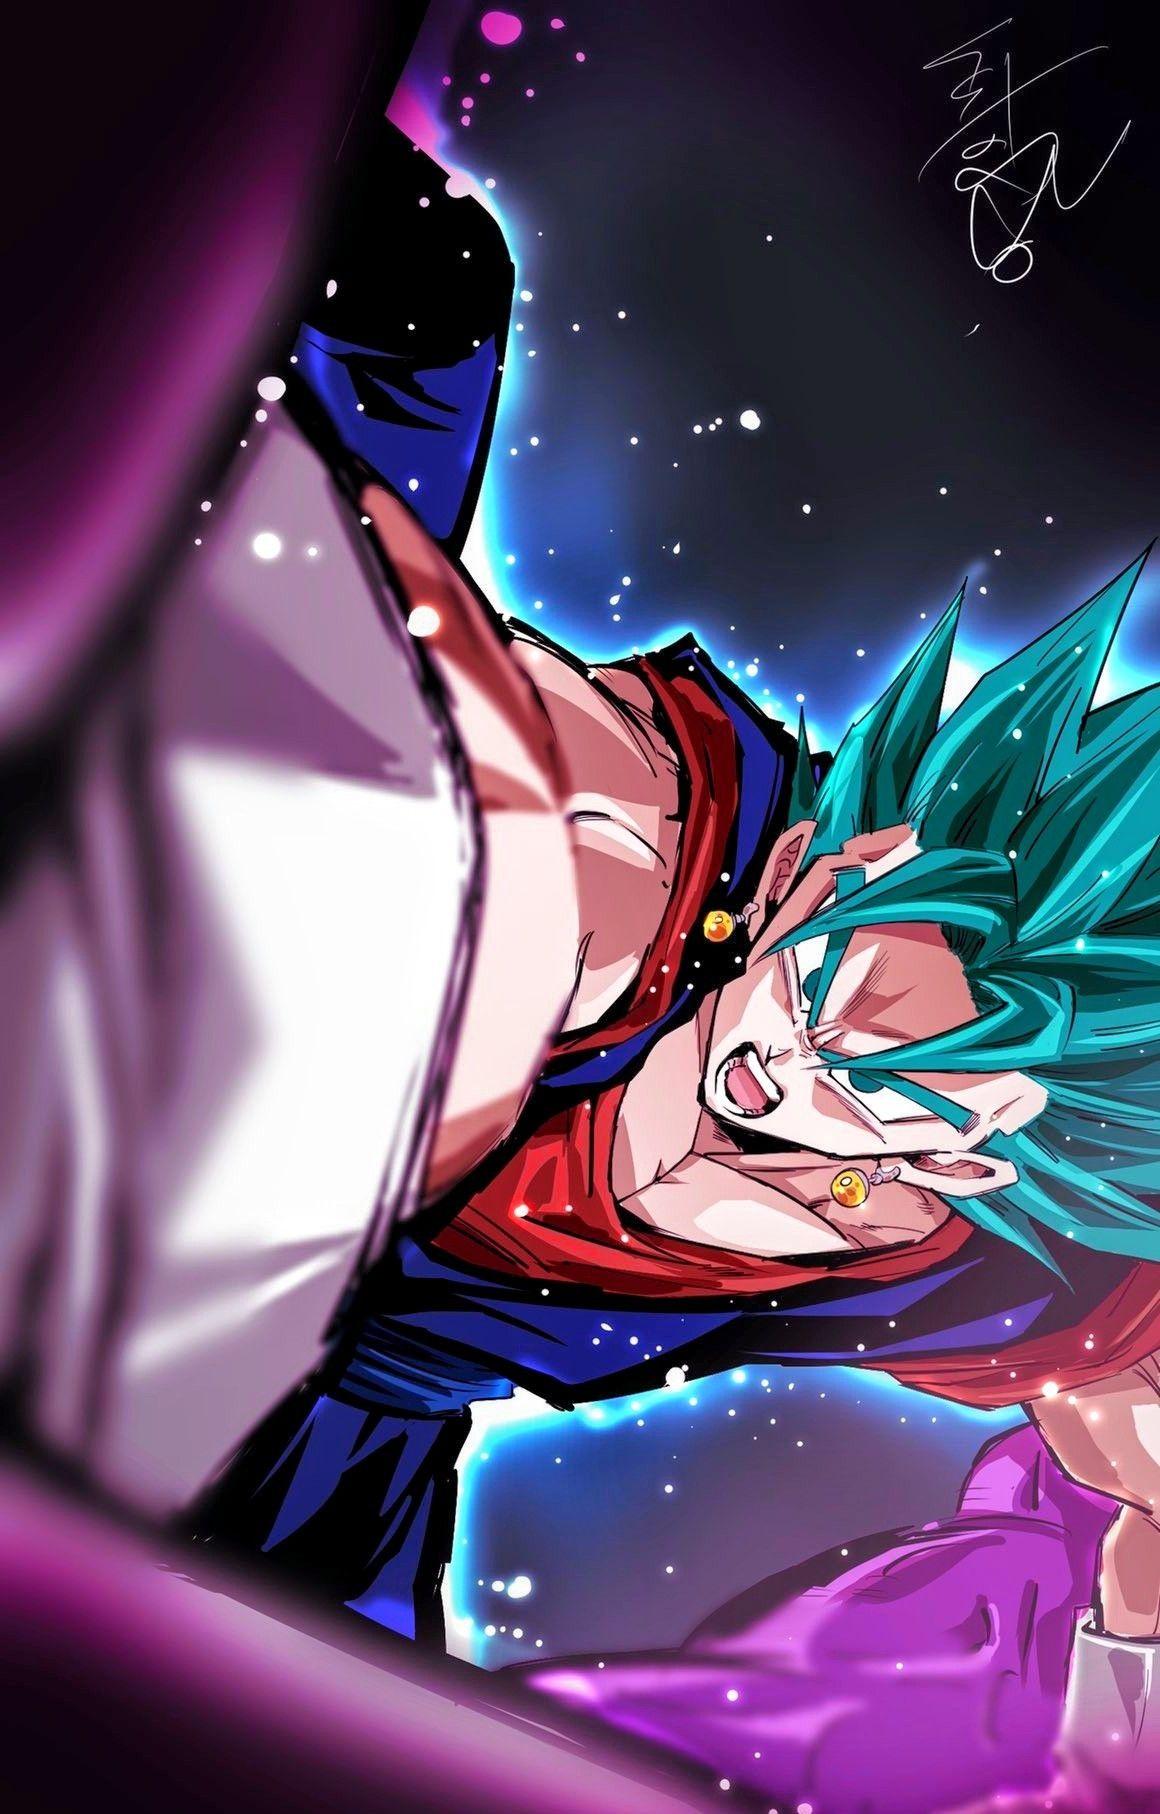 Vegito Vs Zamasu Anime Dragon Ball Super Dragon Ball Artwork Dragon Ball Super Goku